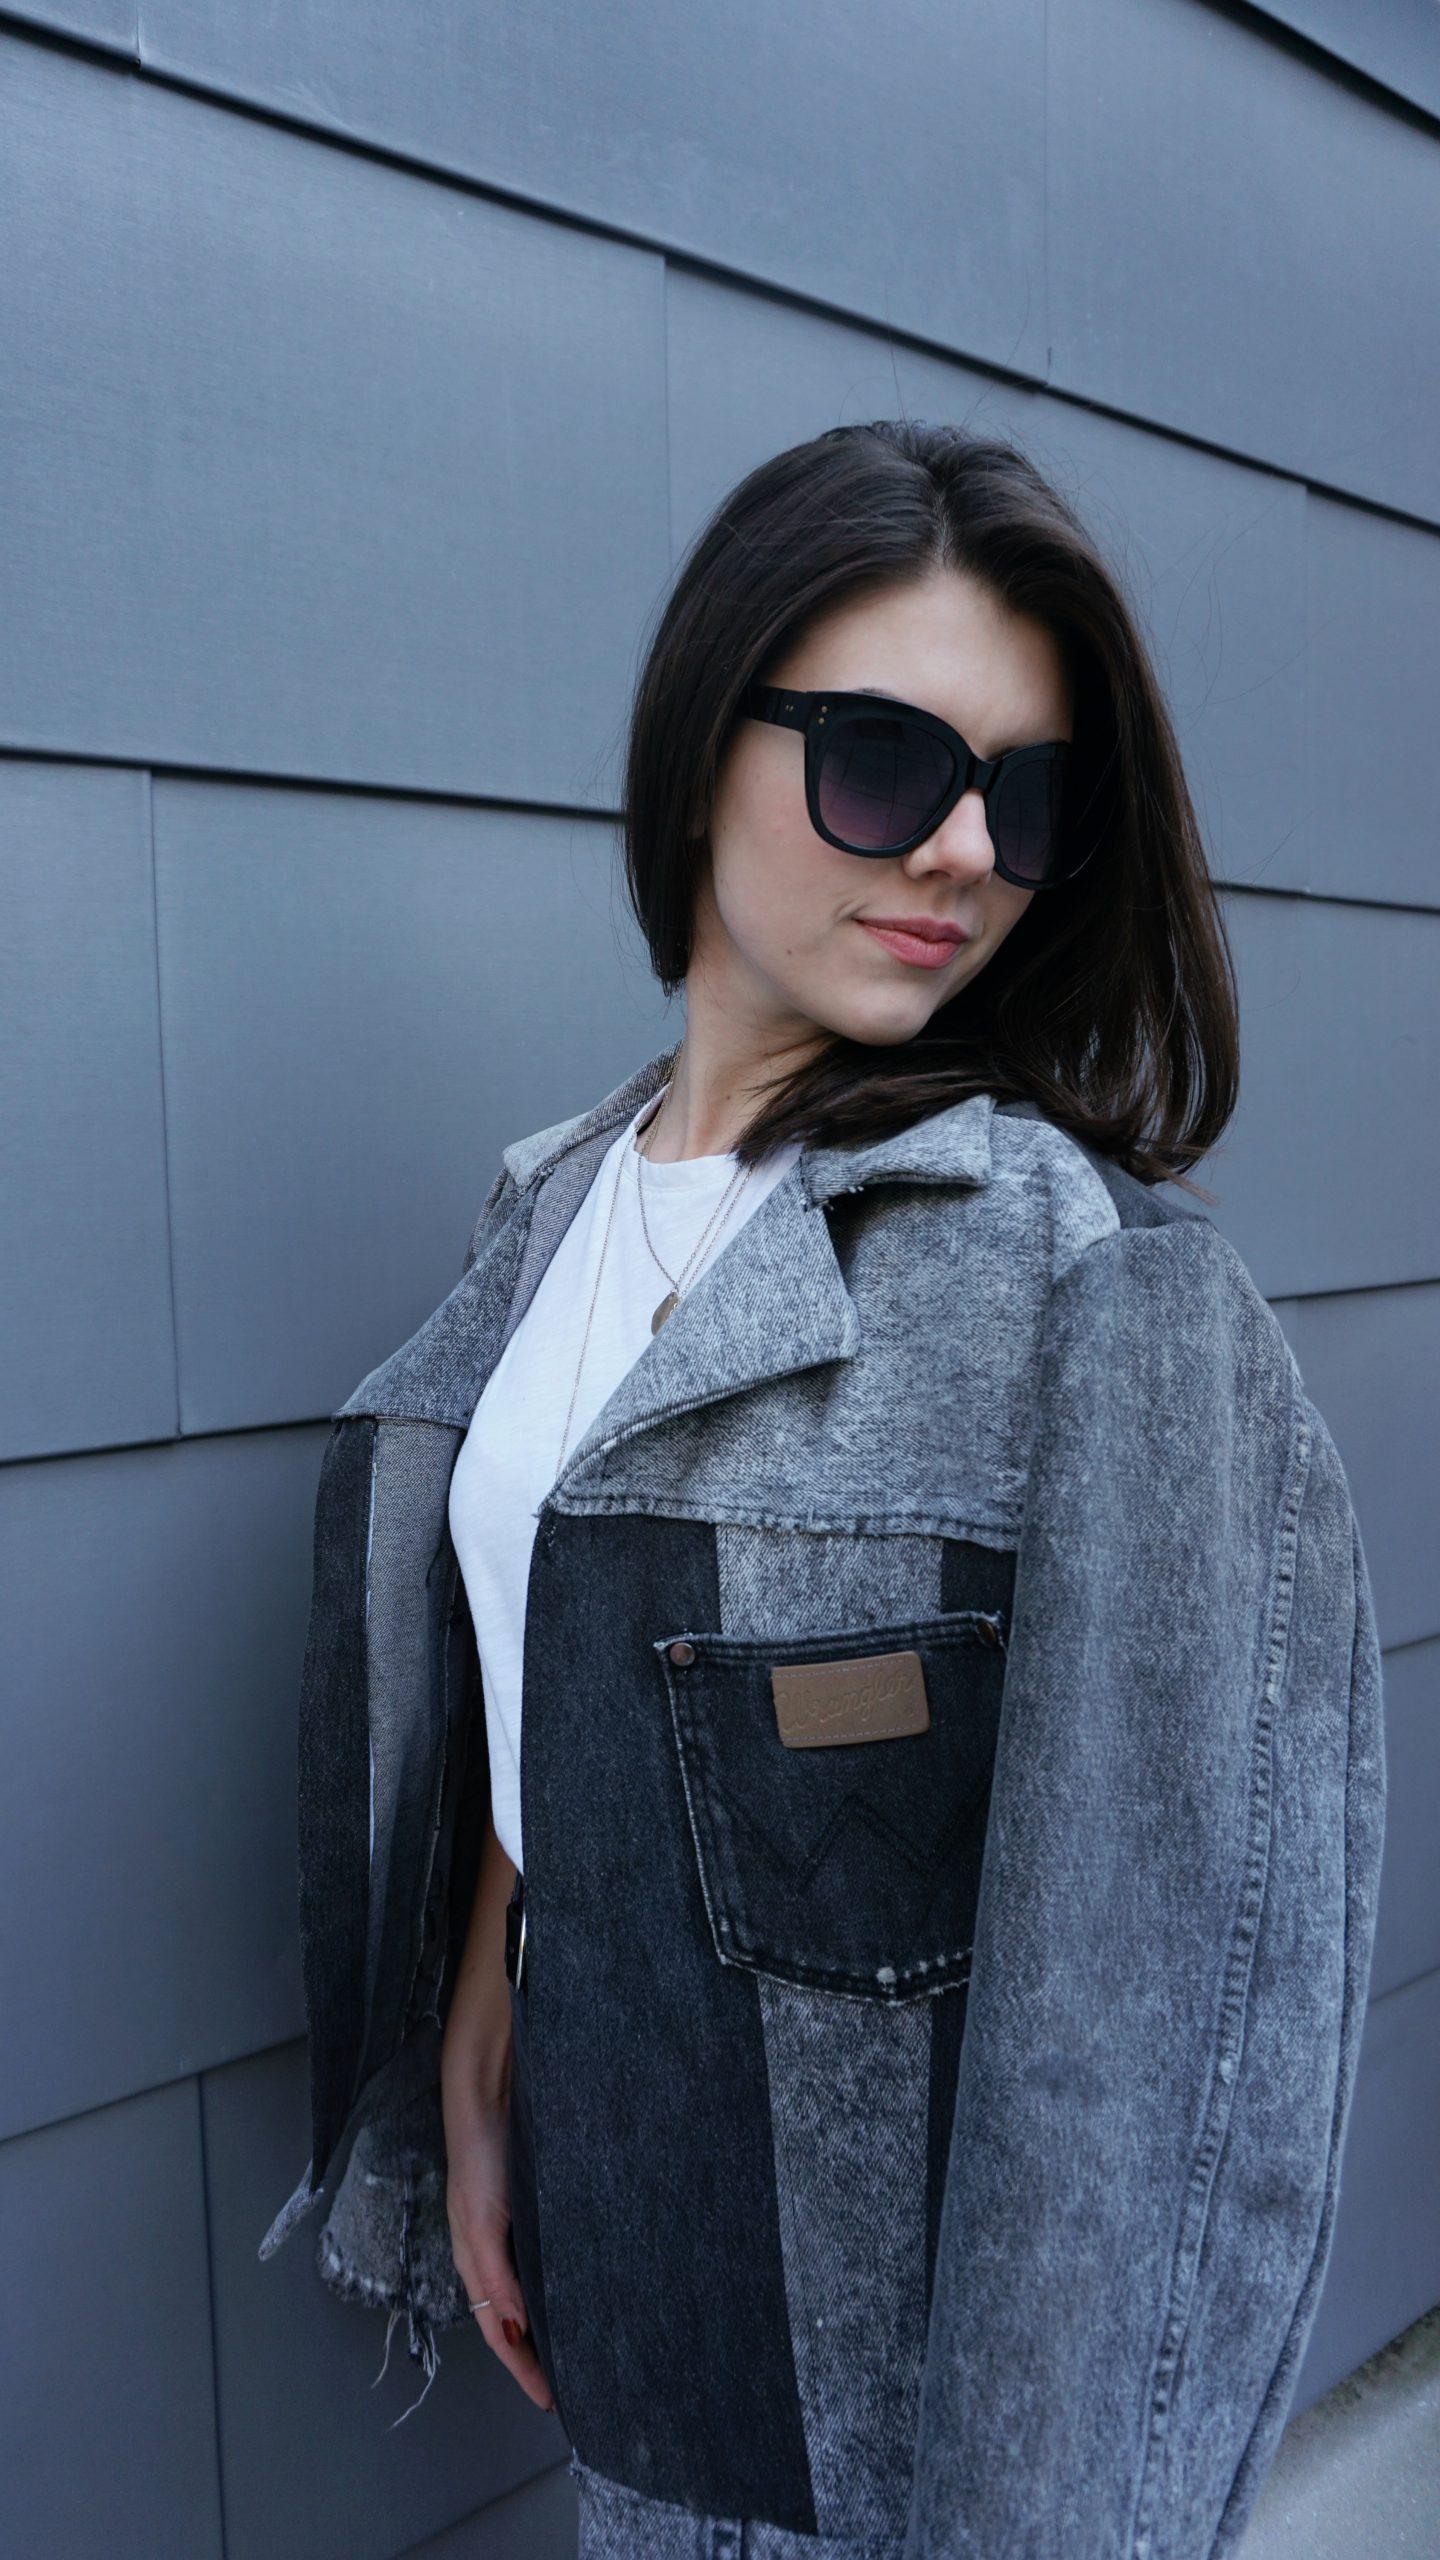 Mattney Yates upcycled jean jackets patchwork